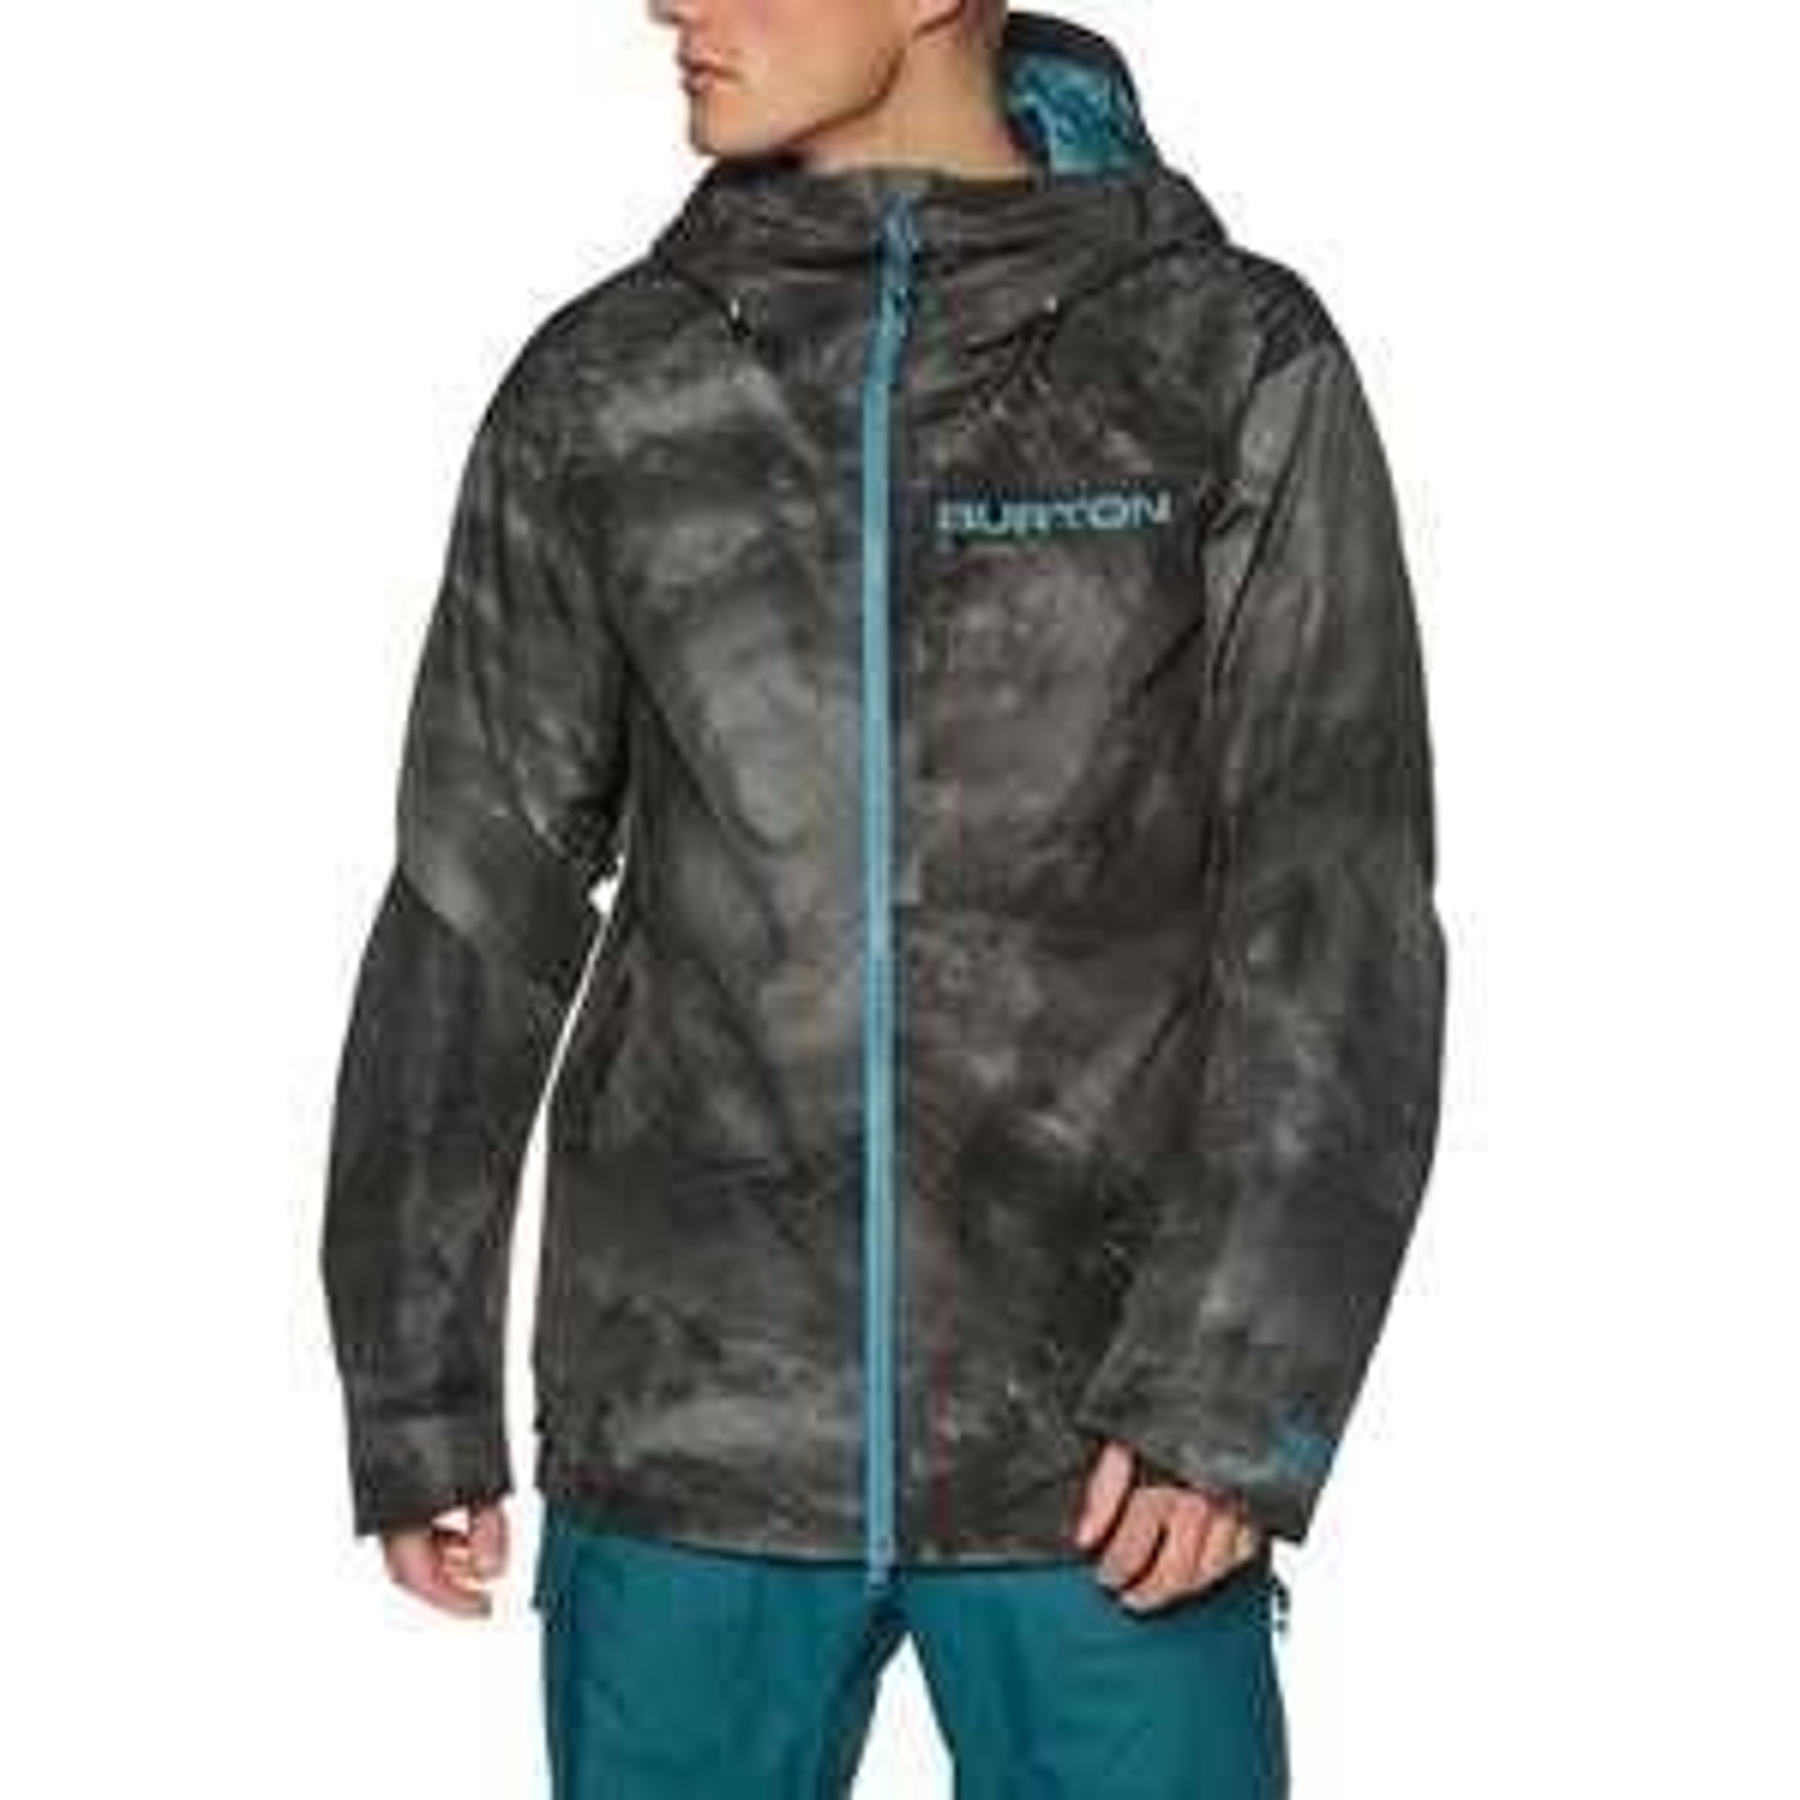 Burton Radial Gore Tex Waterproof Jacket £121.45 with code @ Surfdome